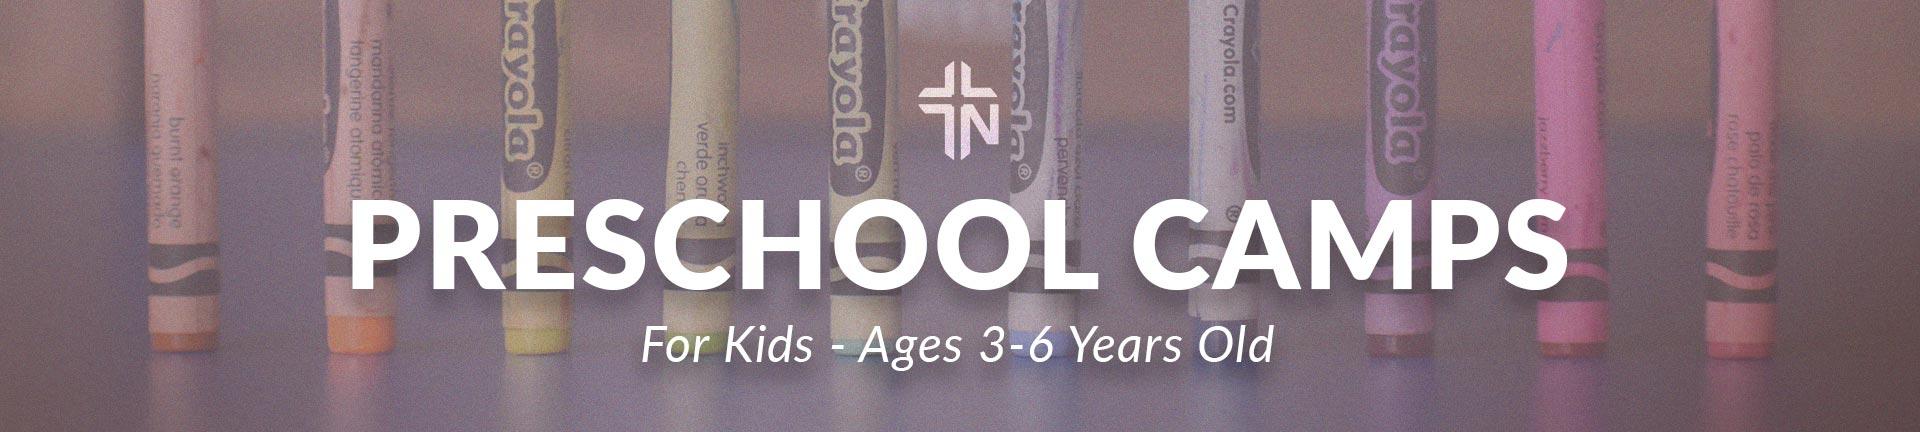 Preschool Weekly Summer Camp Web Hero Graphic